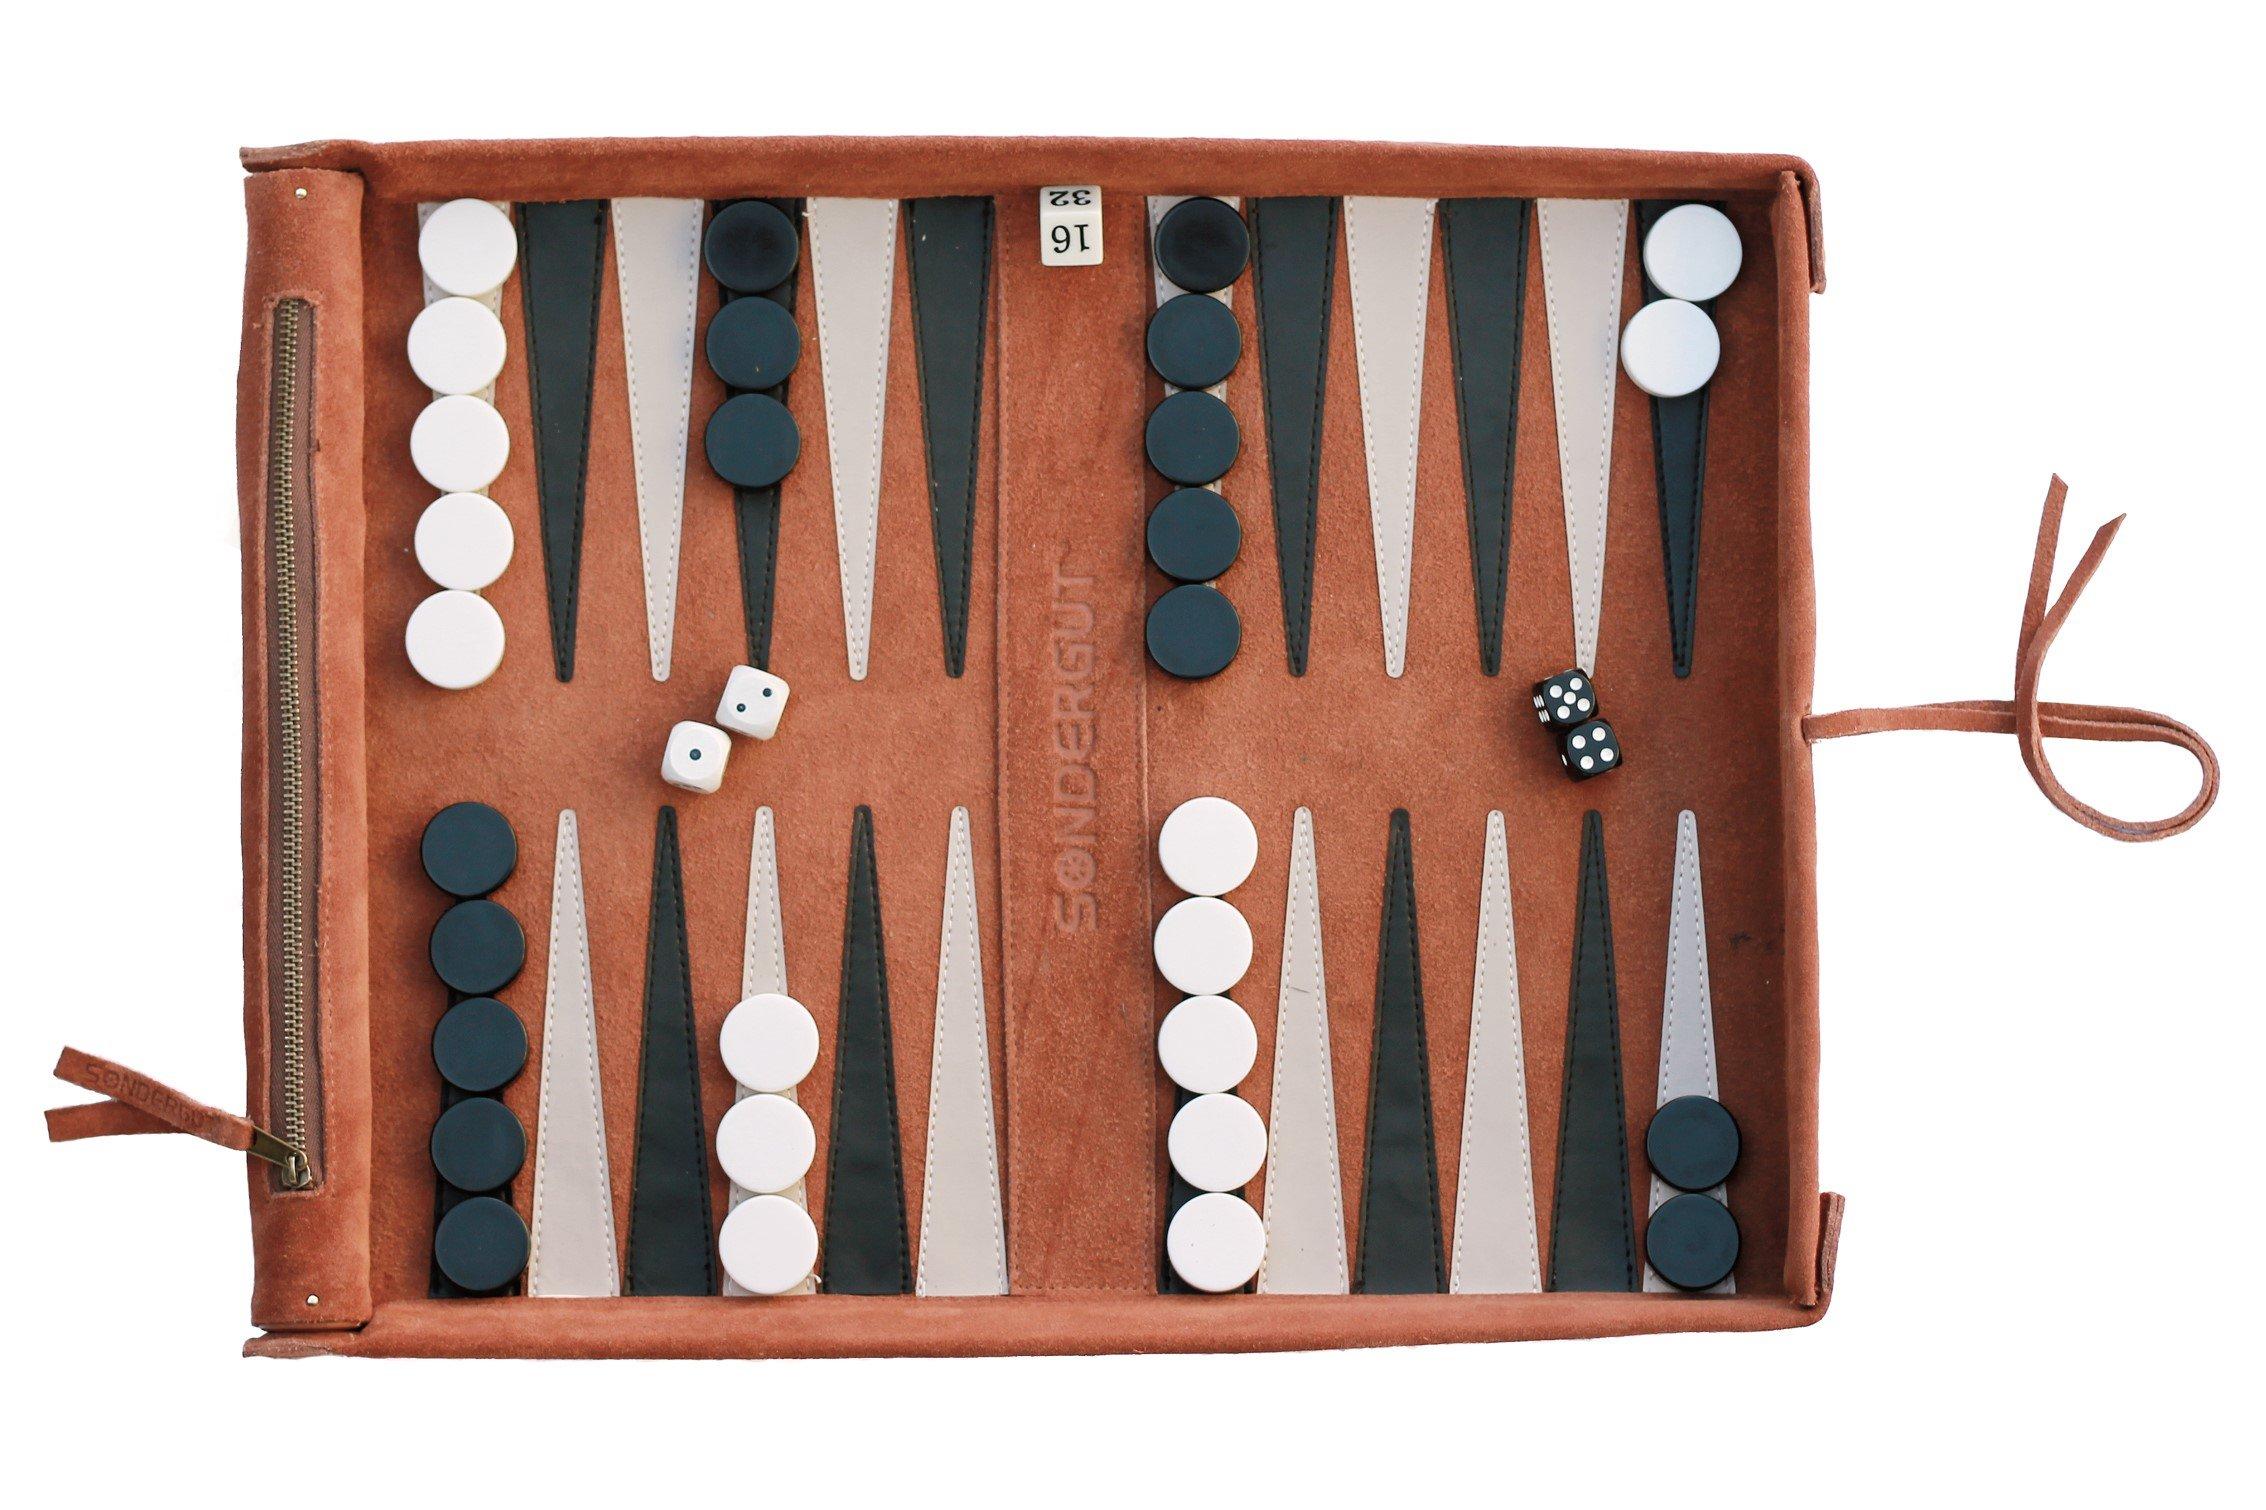 Sondergut Deluxe Roll-up Backgammon Game